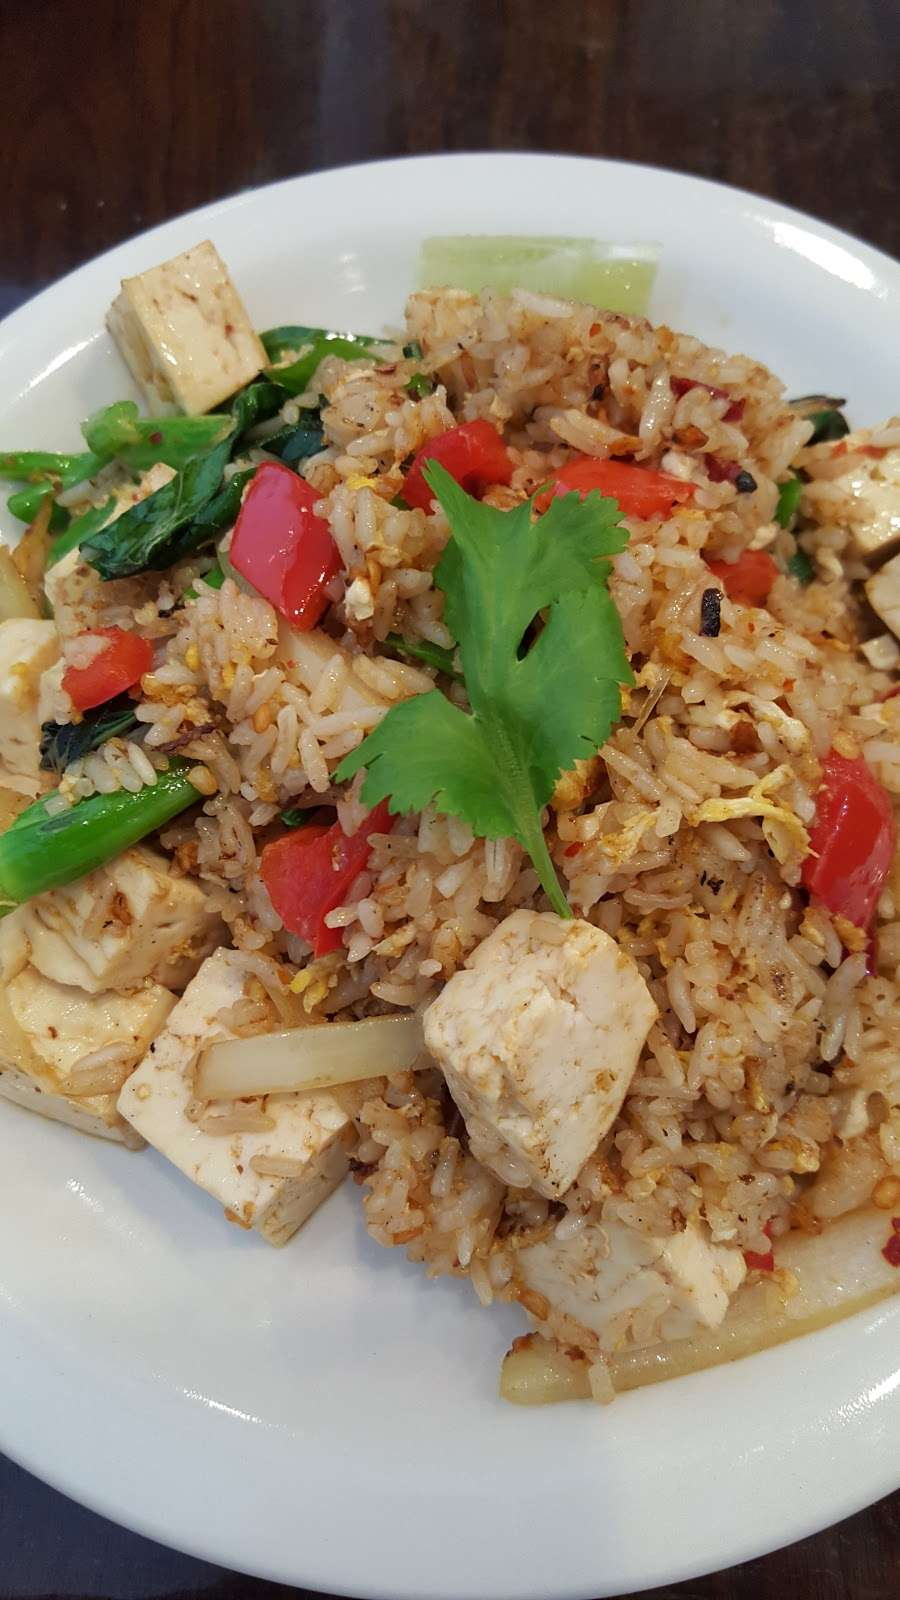 Chok Dee Thai Kitchen - restaurant  | Photo 10 of 10 | Address: 561 Livingston St, Norwood, NJ 07648, USA | Phone: (201) 750-8880